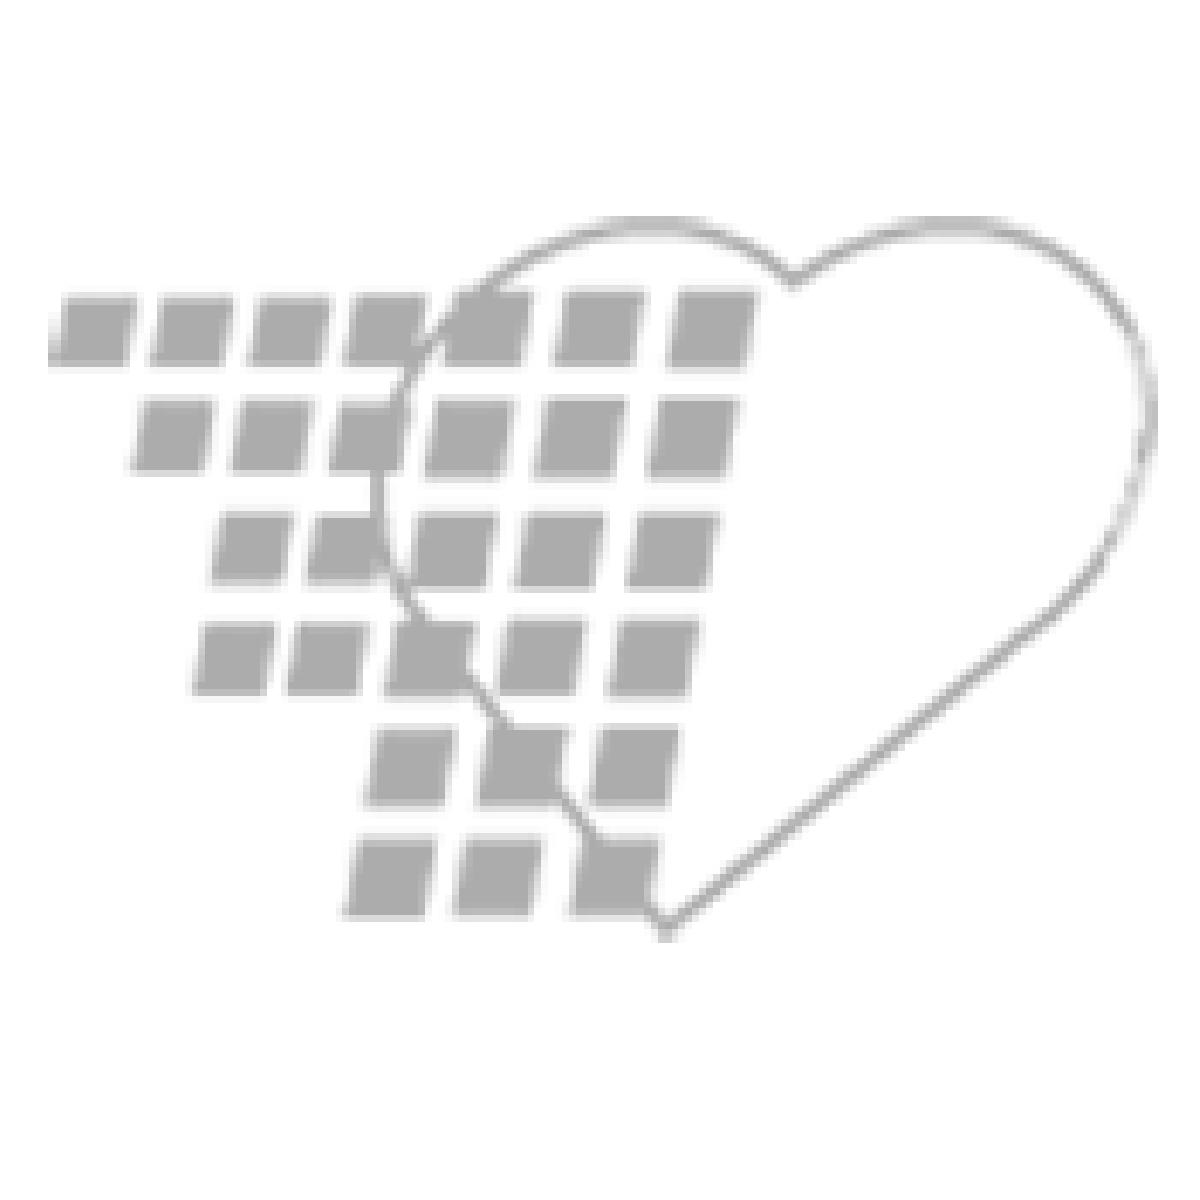 06-93-1106 - Demo Dose® Vasopressn 1 mL MDV 20 units/mL